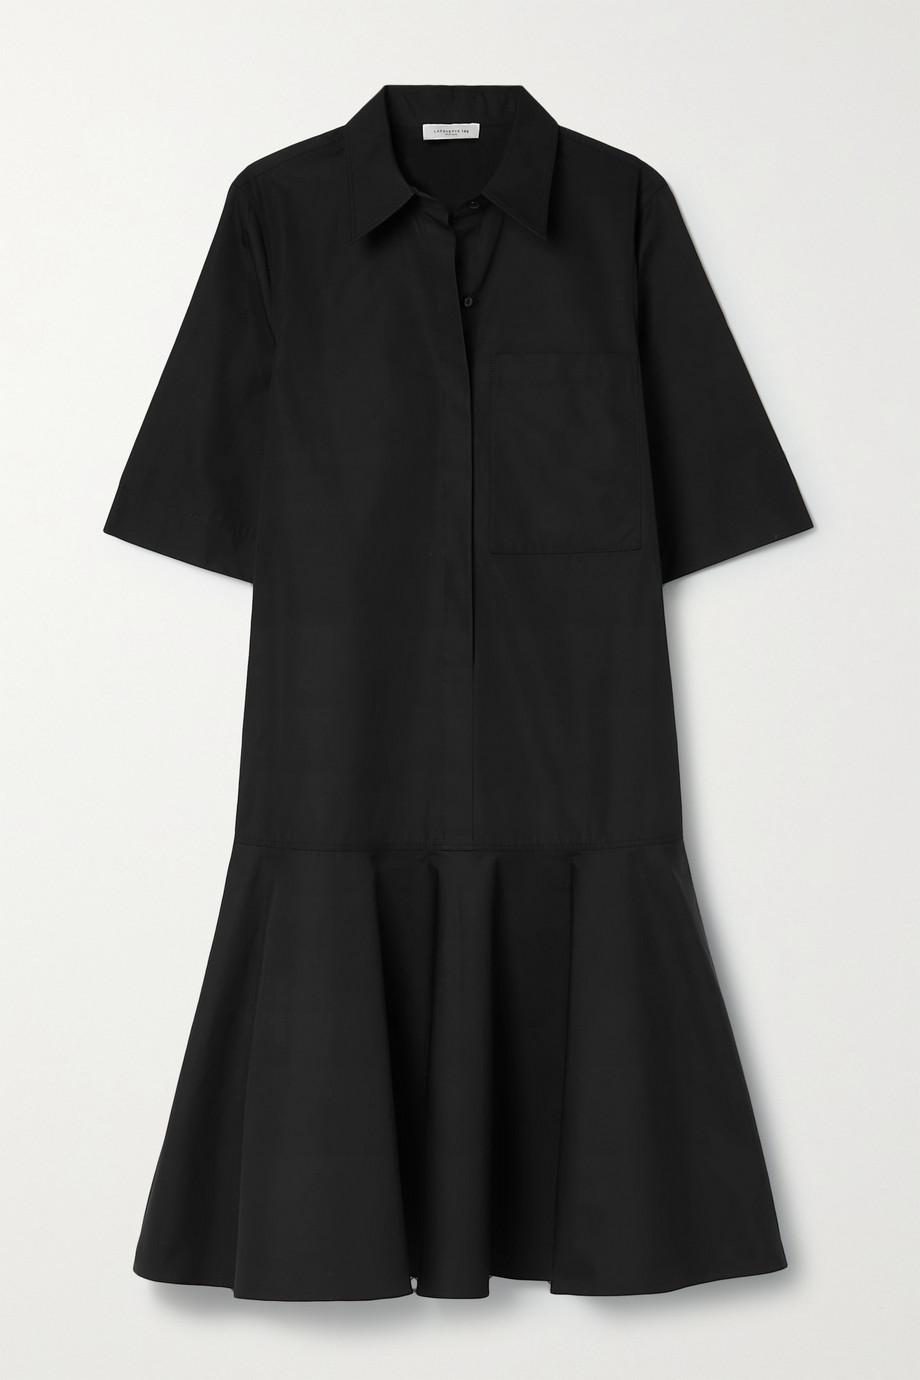 Lafayette 148 Robe-chemise en popeline de coton Bailey